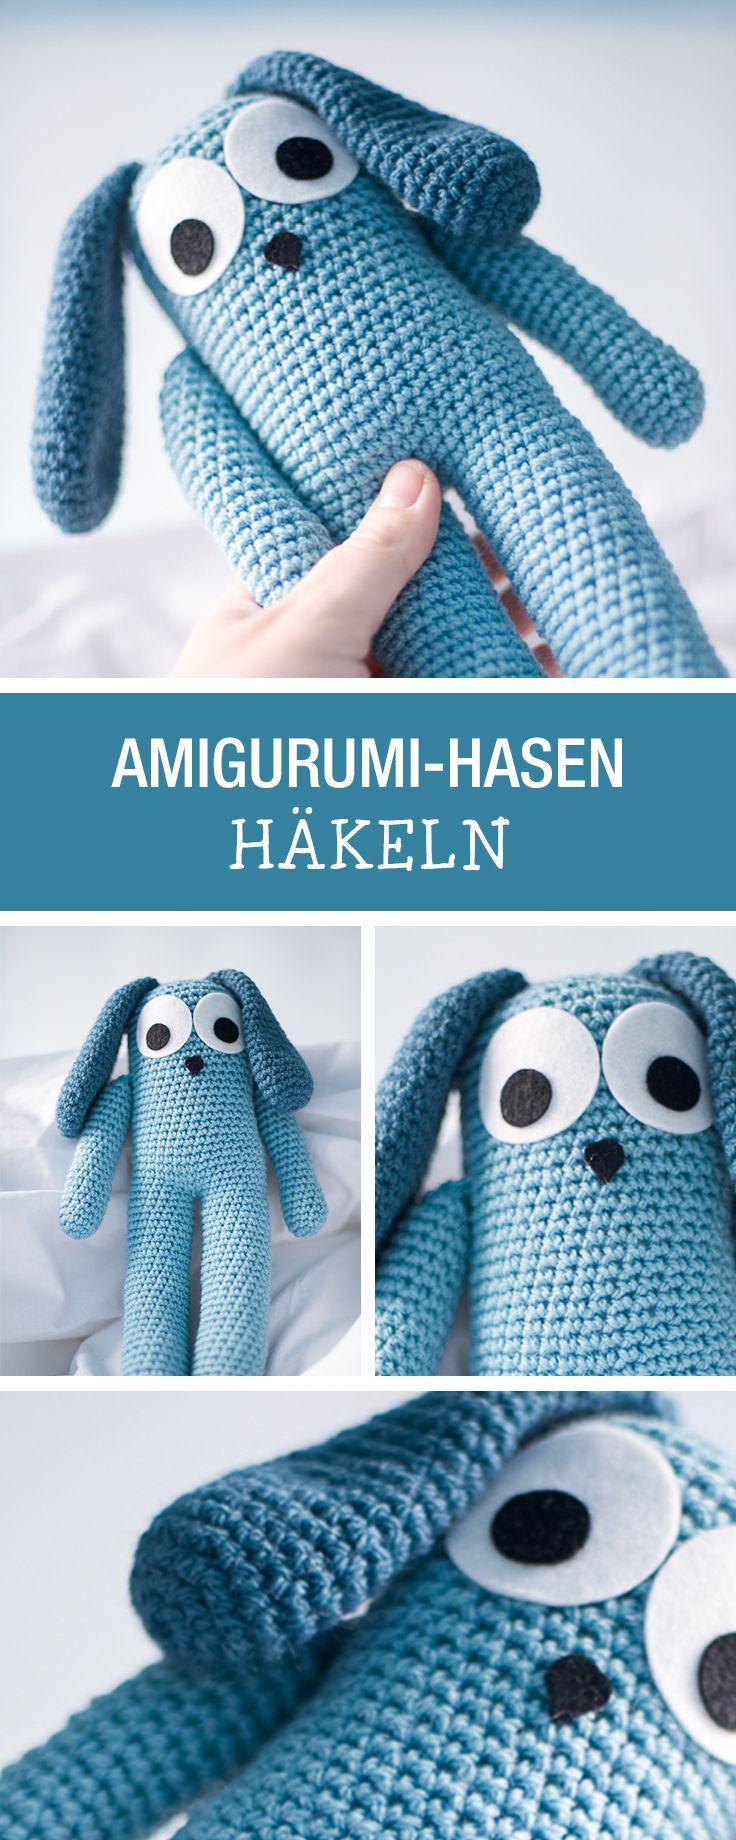 DIY-Anleitung: Kuscheltier-Hasen häkeln, kleines Amigurumi Spielzeug / DIY tutorial: crocheting small soft toy bunny, small amigurumi toy via DaWanda.com